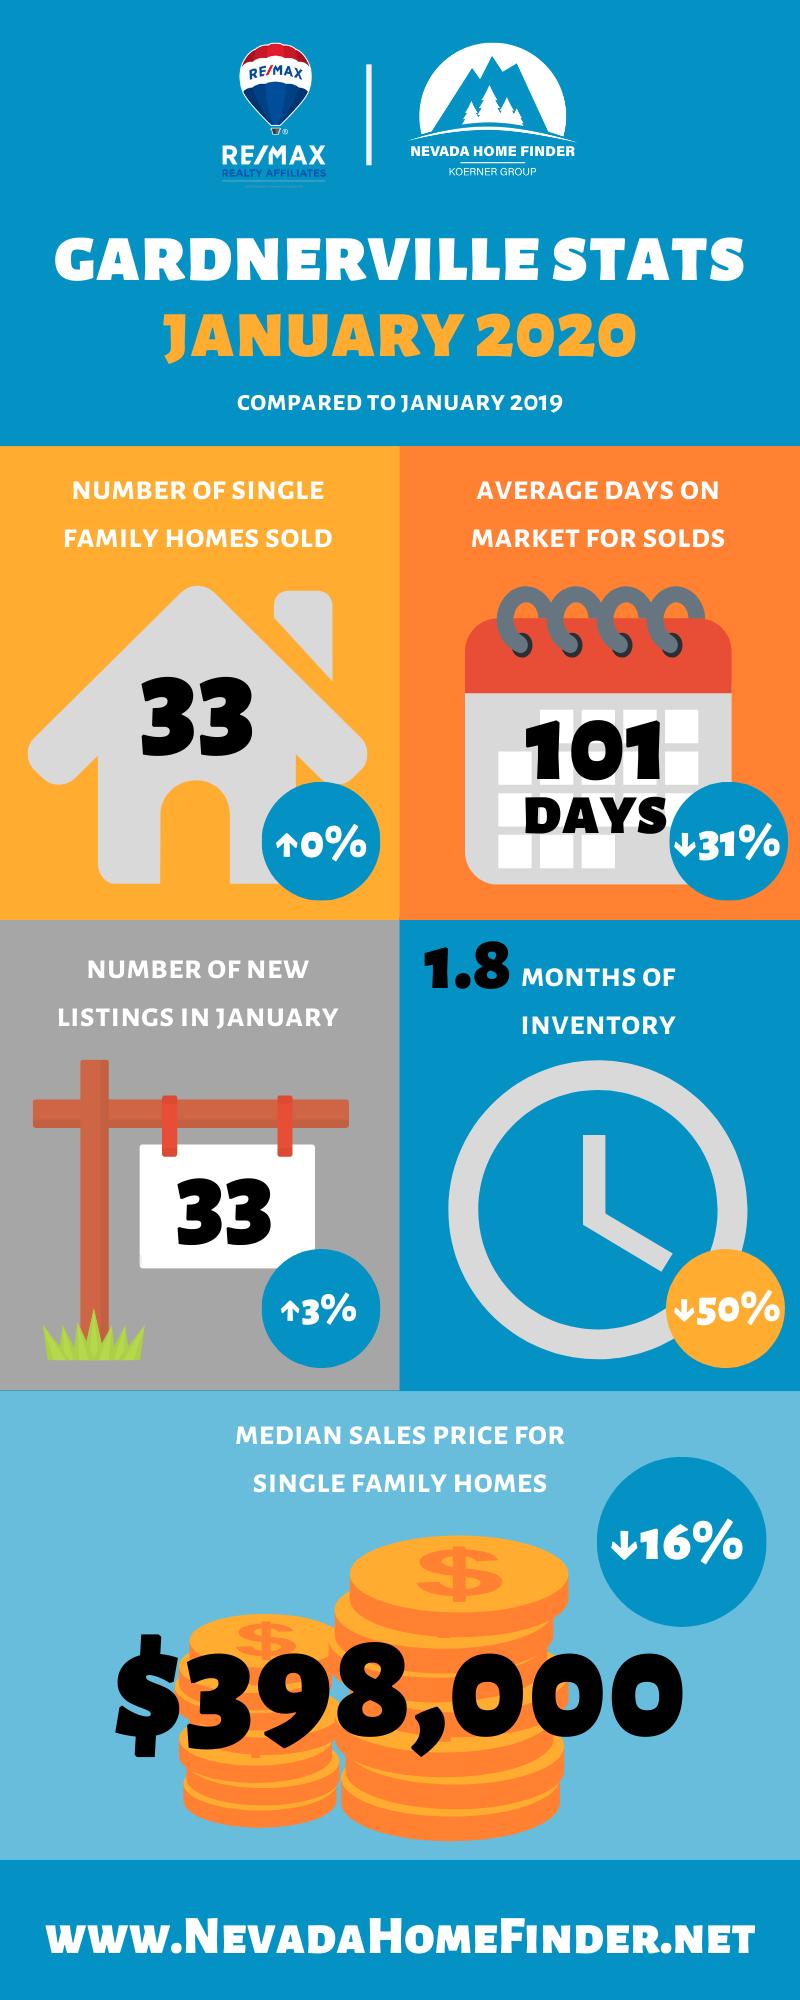 January 2020 market statistics for Gardnerville, NV.